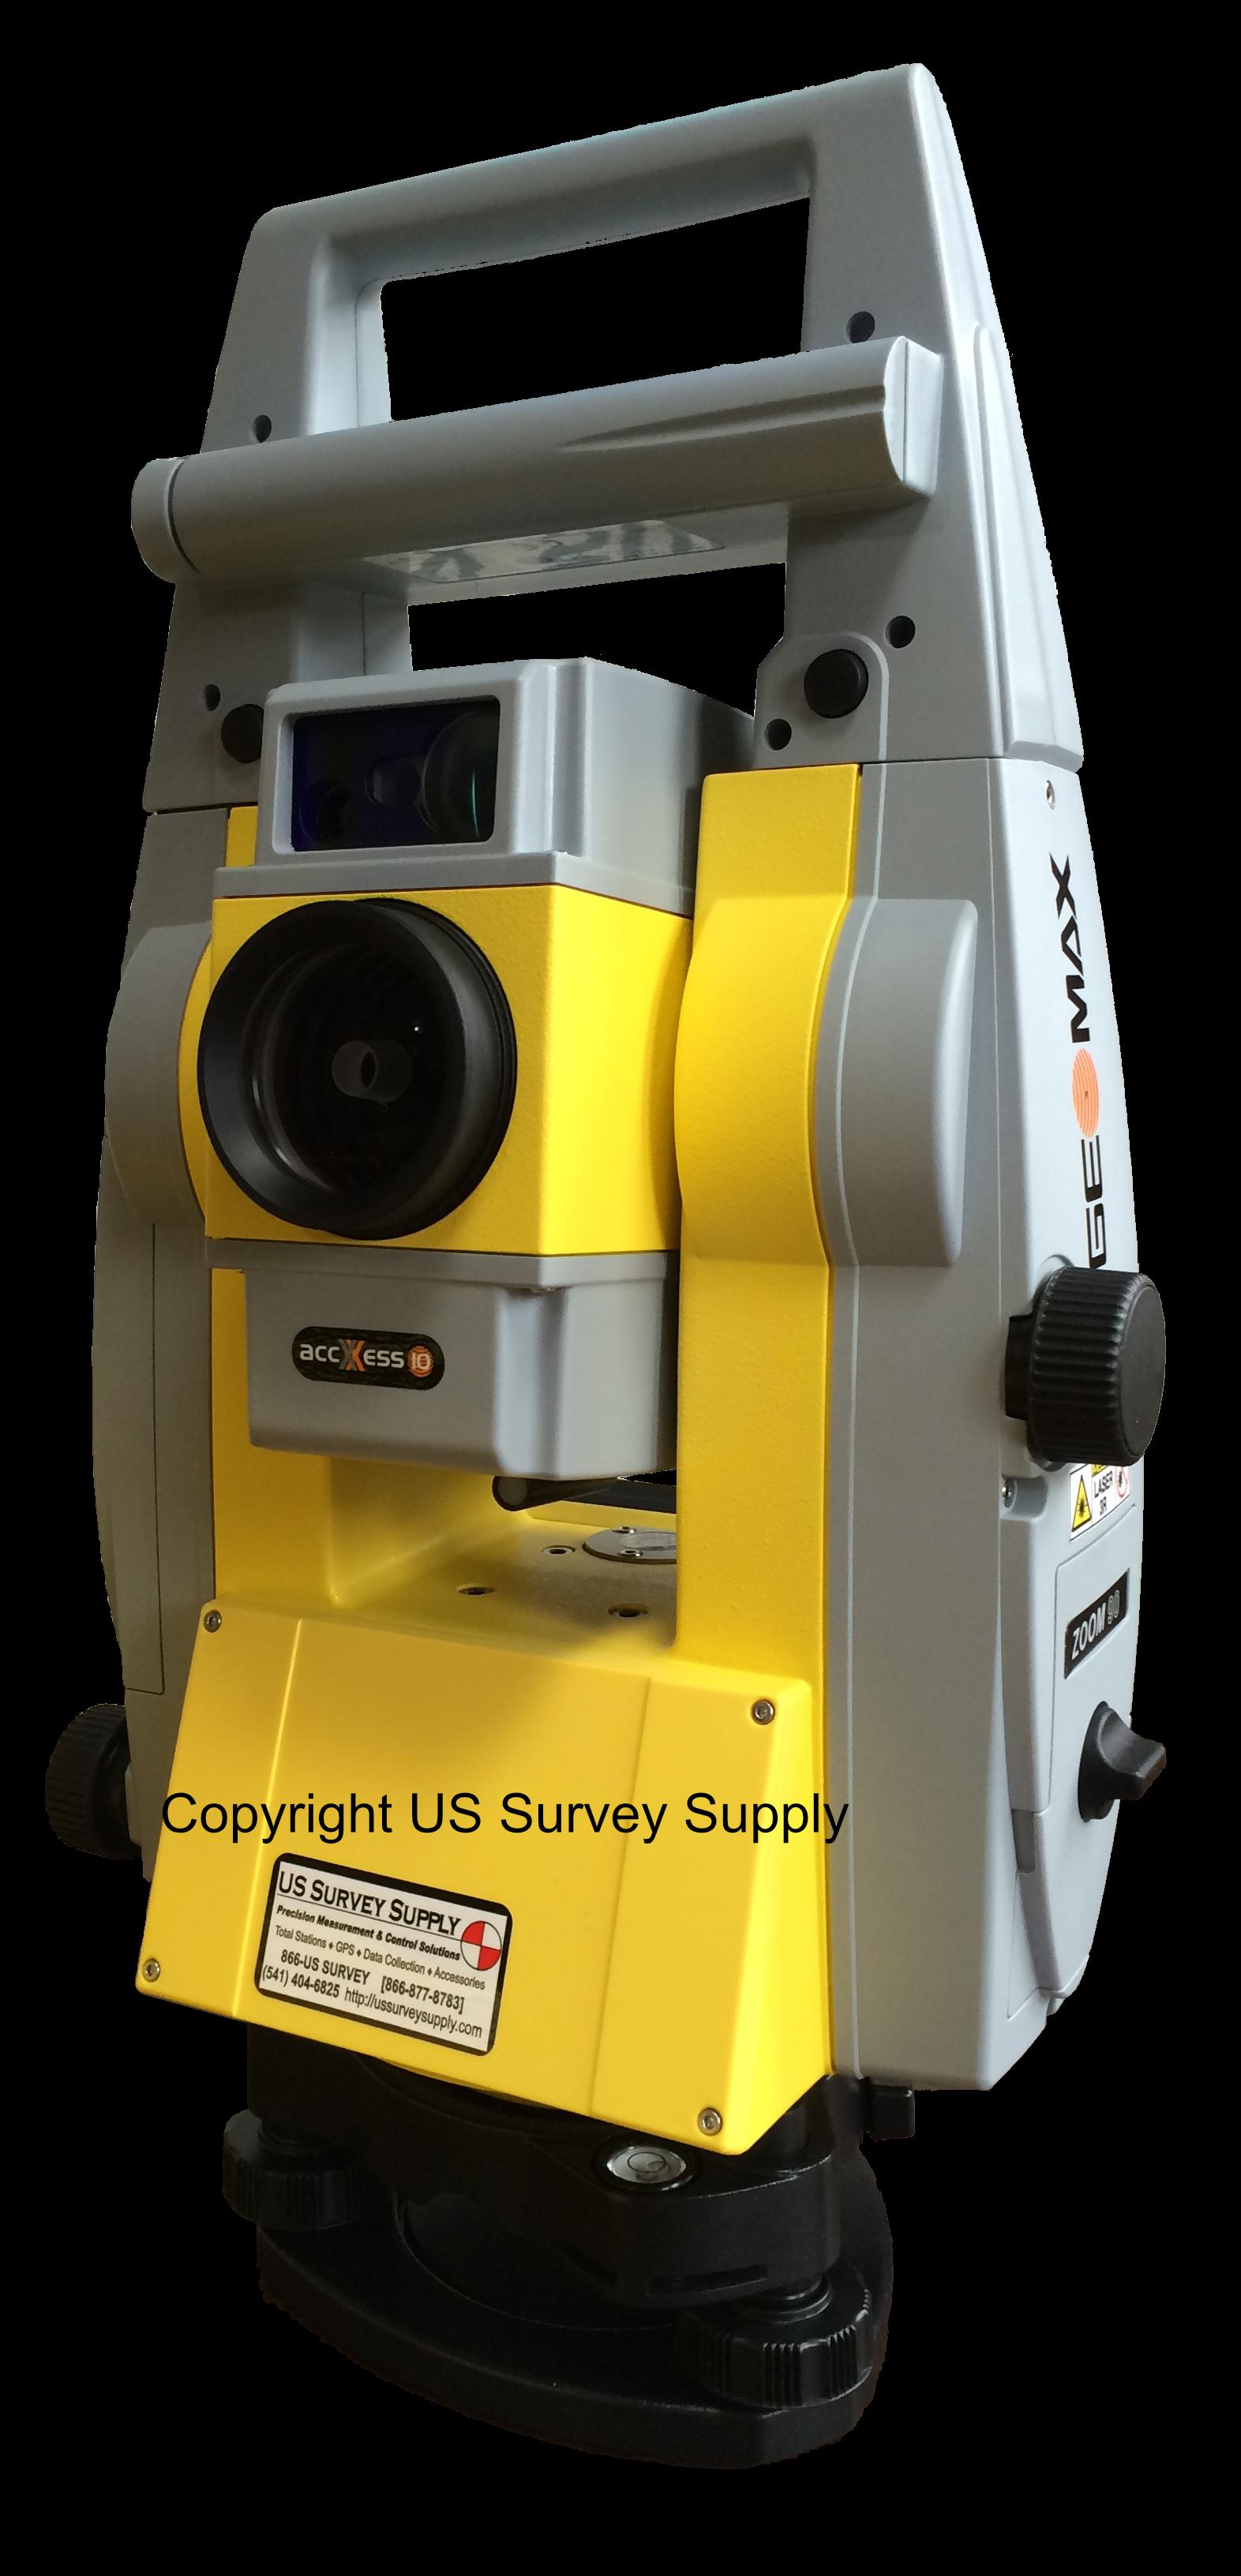 Carlson CR+ - US Survey Supply